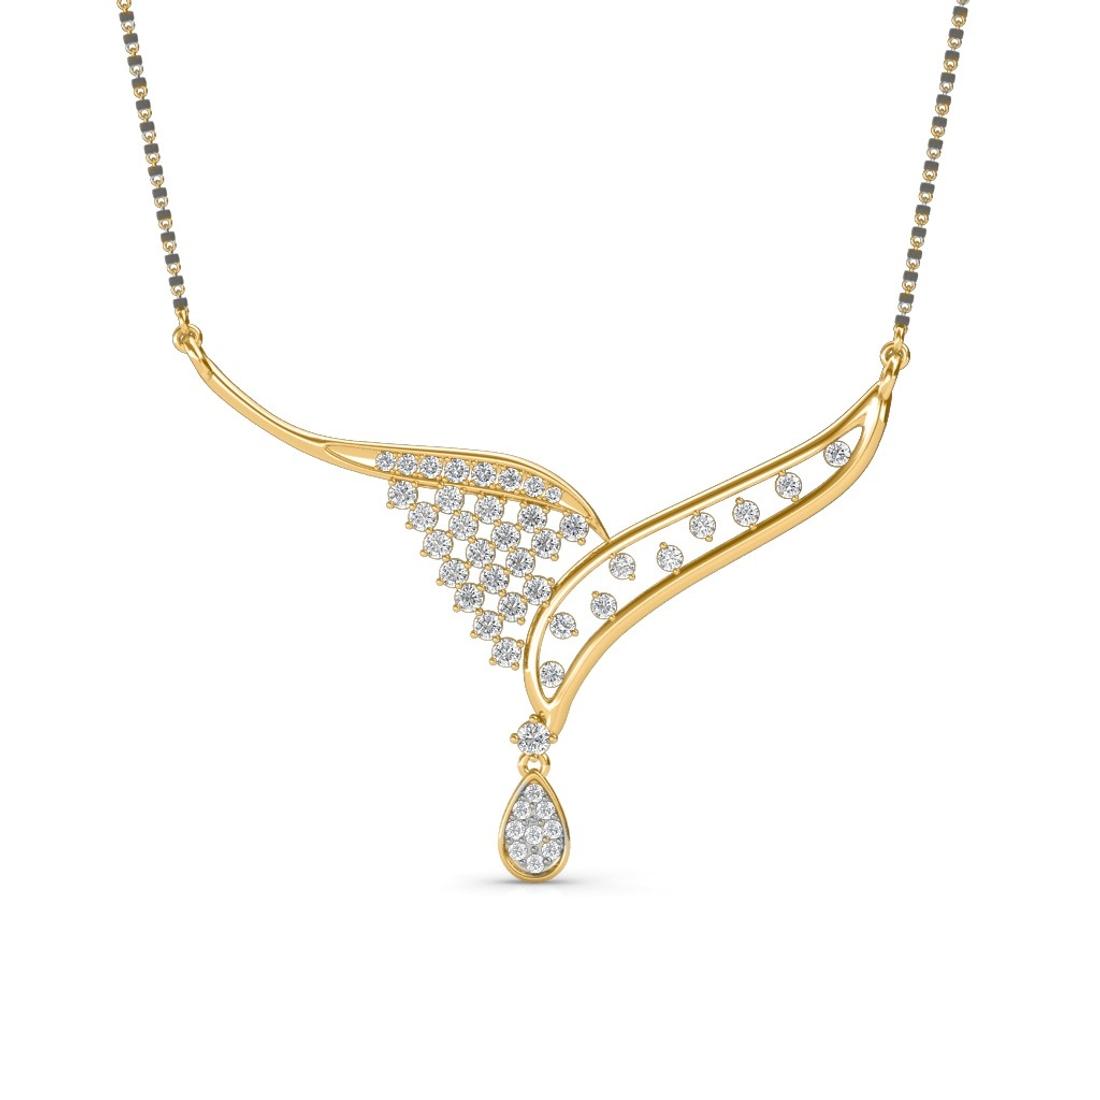 Sarvada Jewels' The Aravinda Mangalsutra